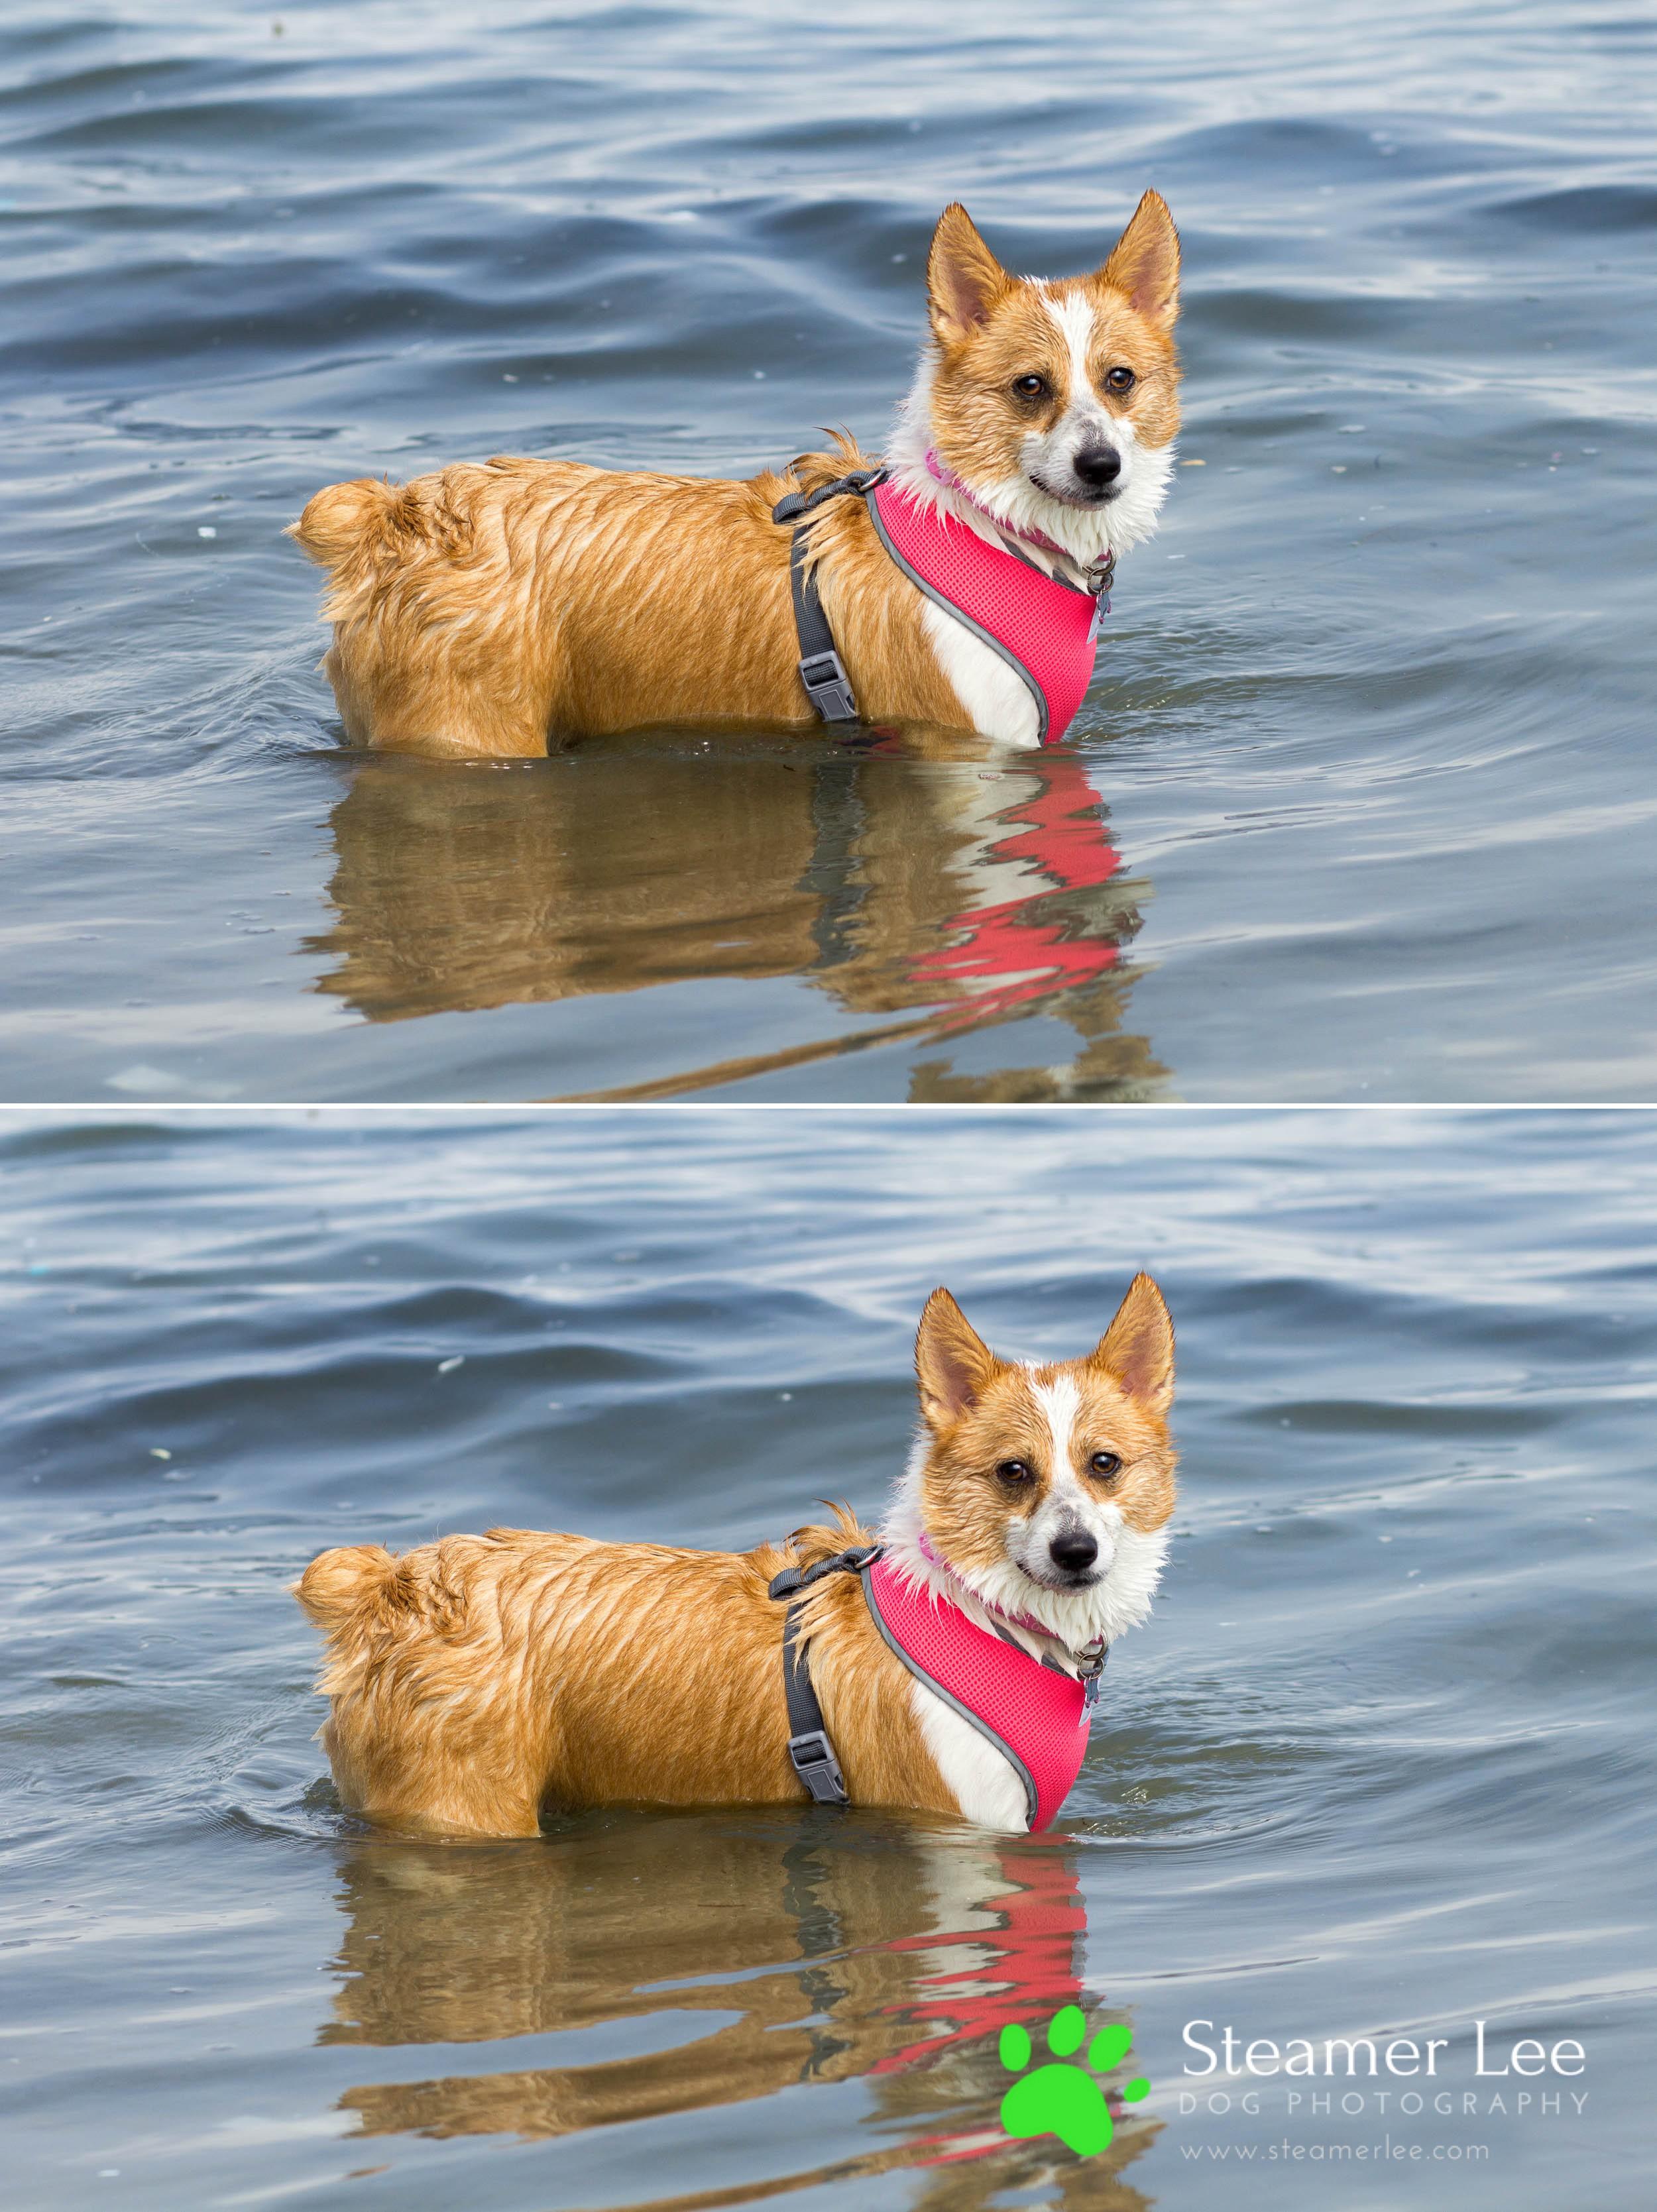 Steamer Lee Dog Photography - July 2017 So Cal Corgi Beach Day - Vol. 3 - 13.jpg